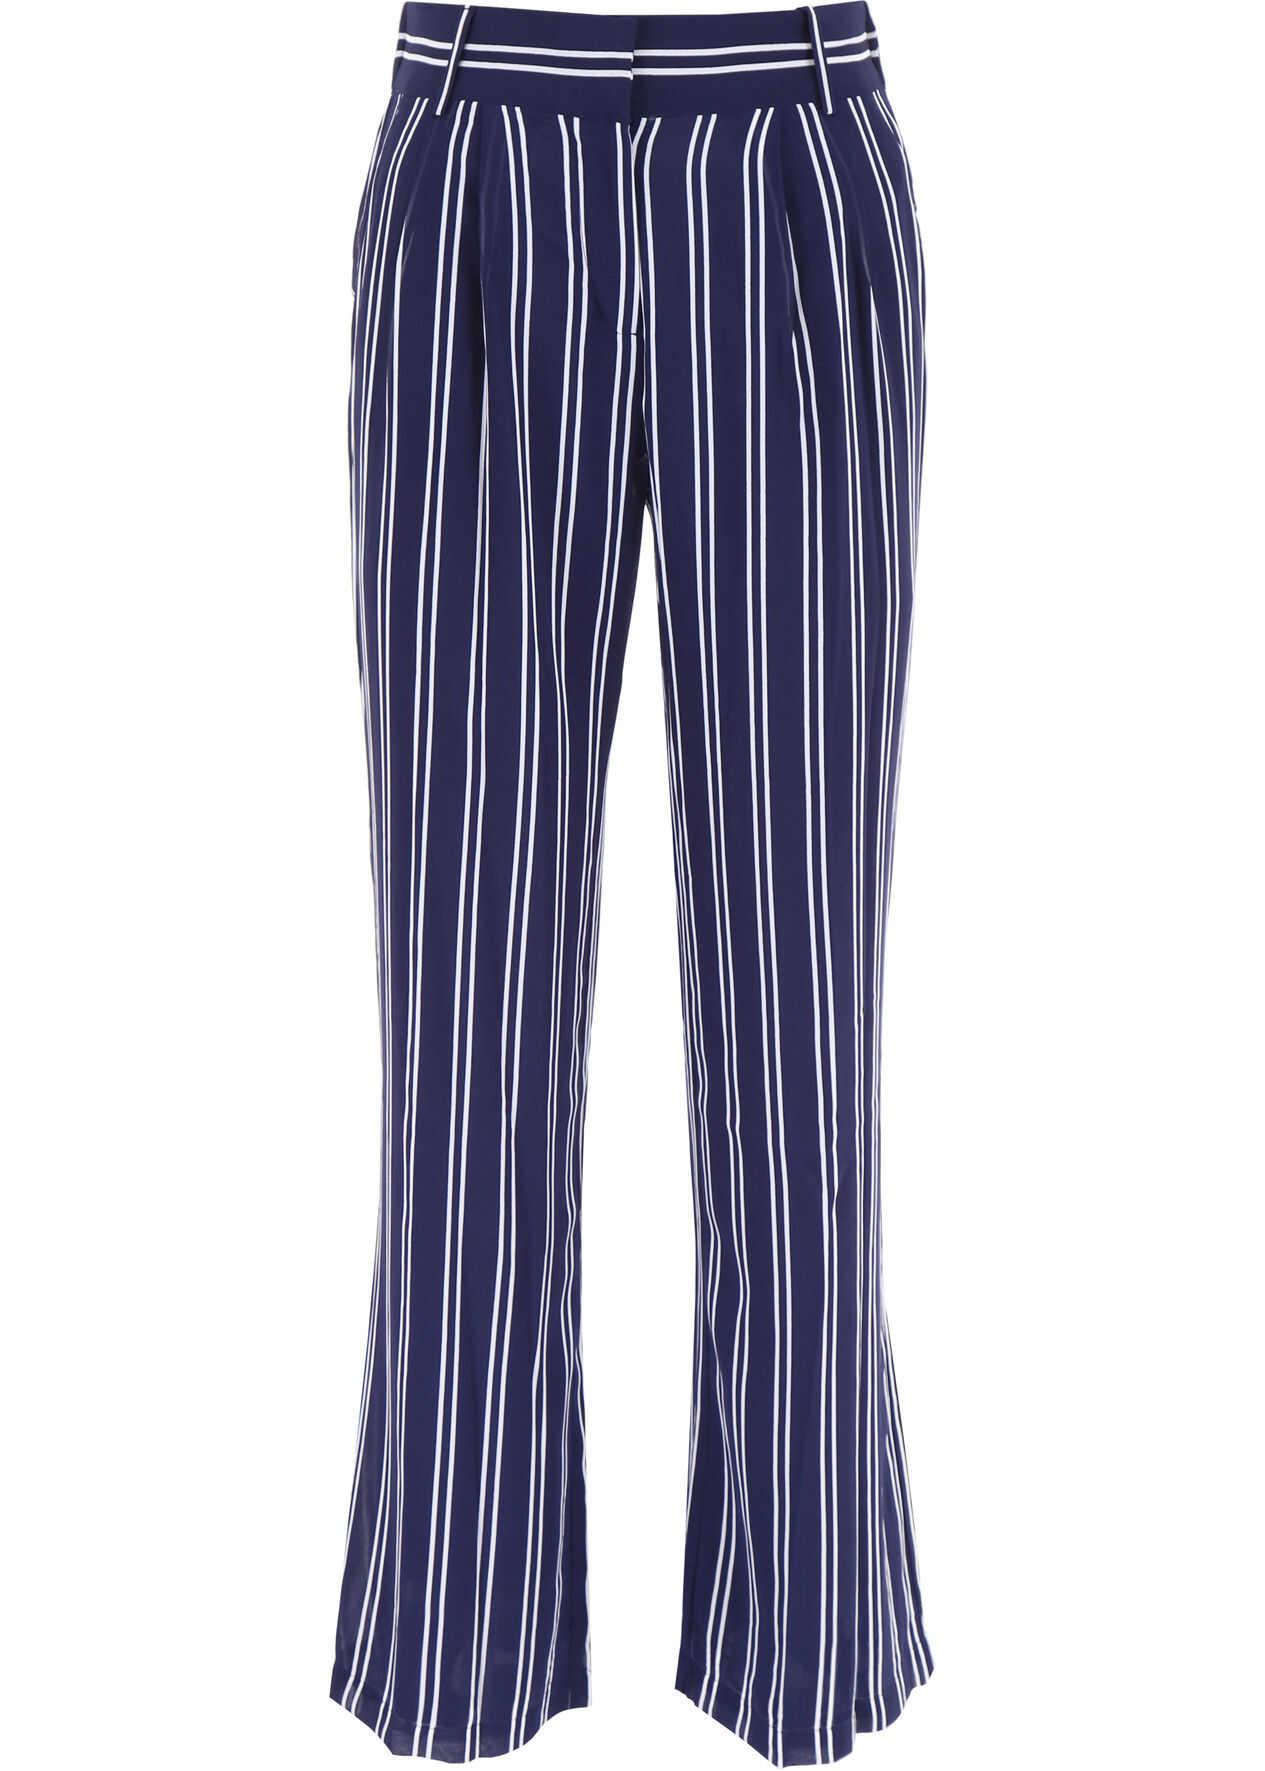 Michael Kors Striped Trousers TRUENVY WHT